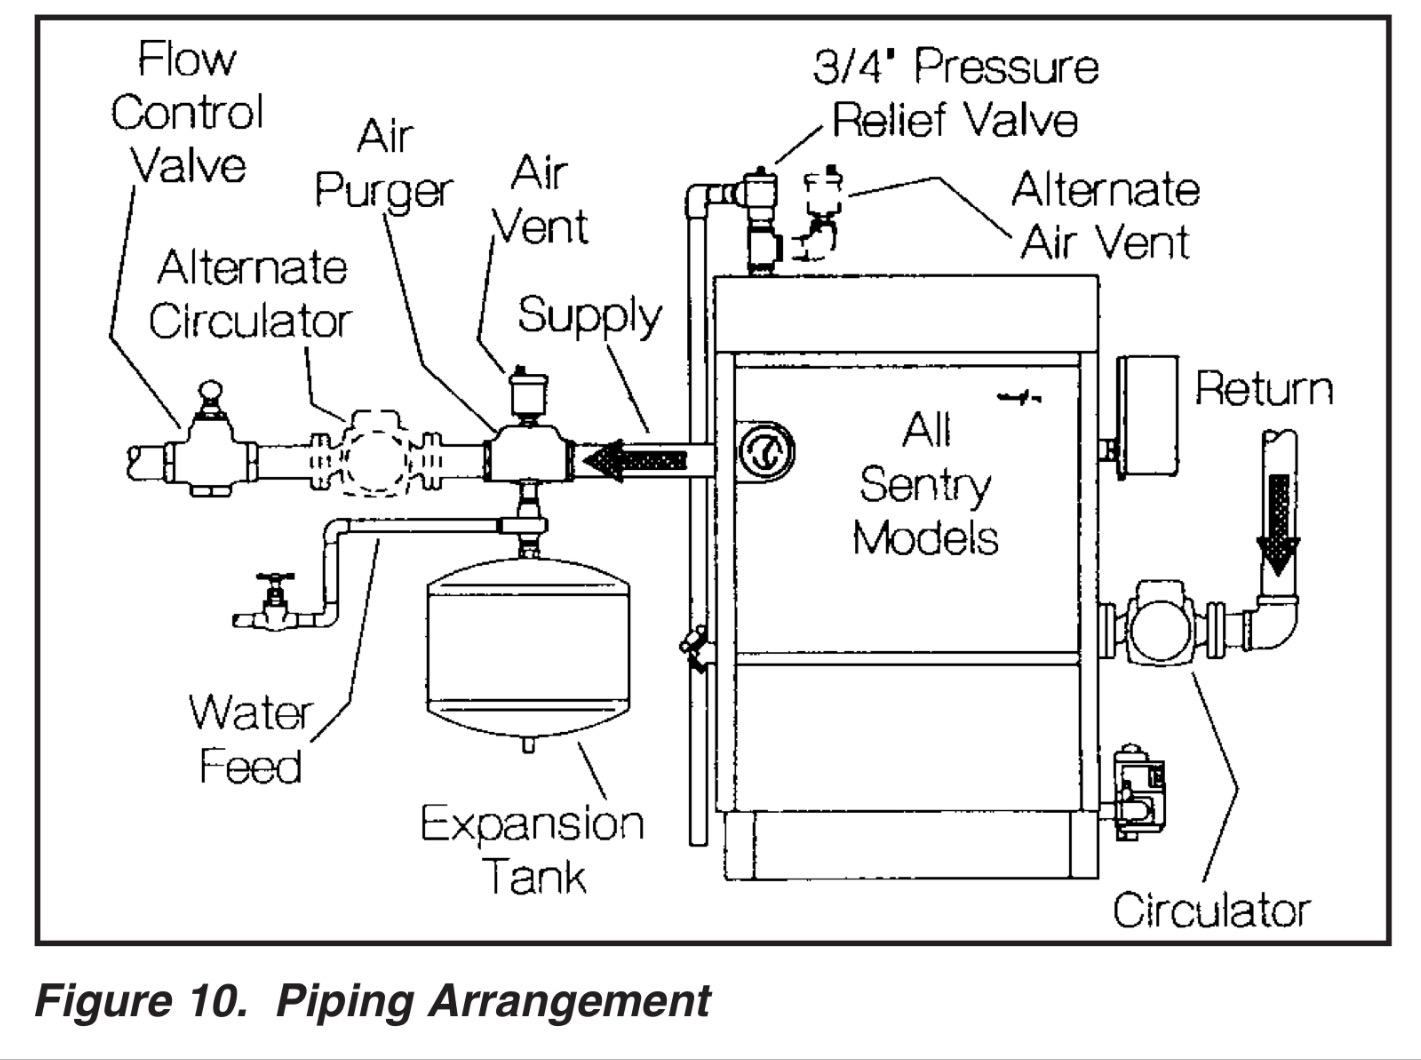 taco pump wiring diagram suzuki mikuni carburetor for 08 125 cartridge circulator installed backwards water